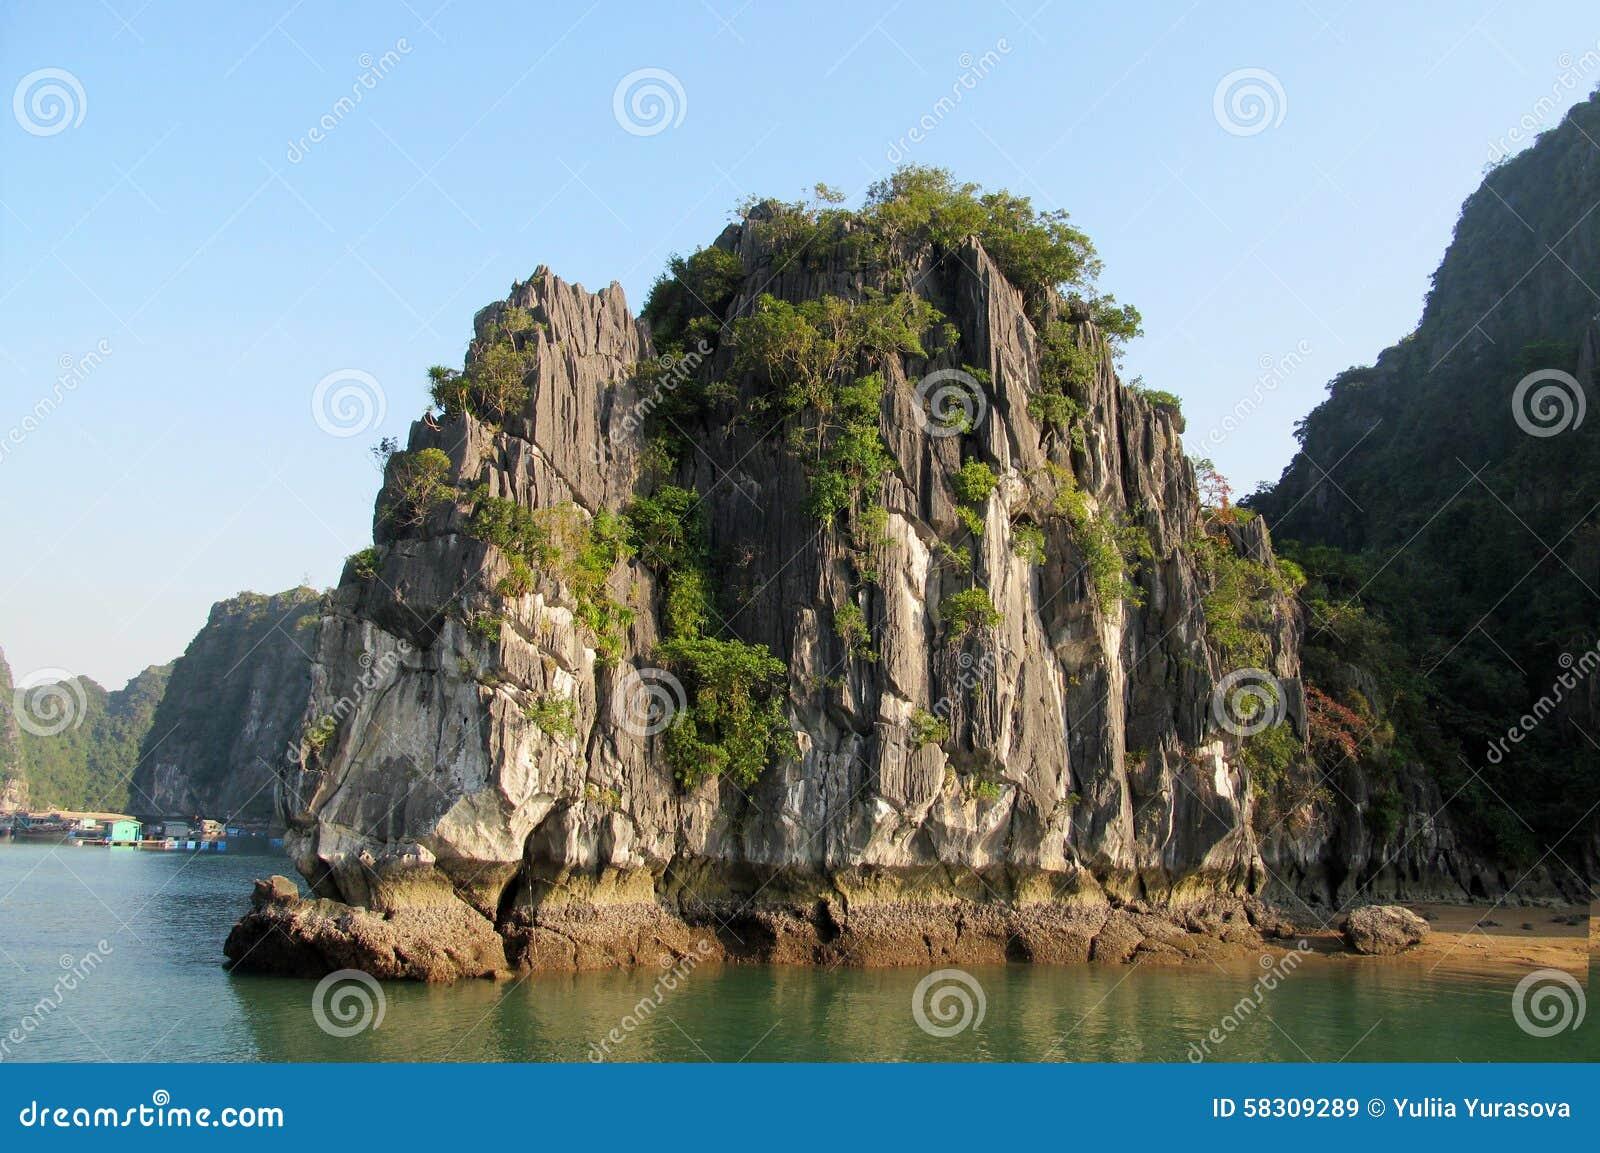 Limestone rocks in the sea bay